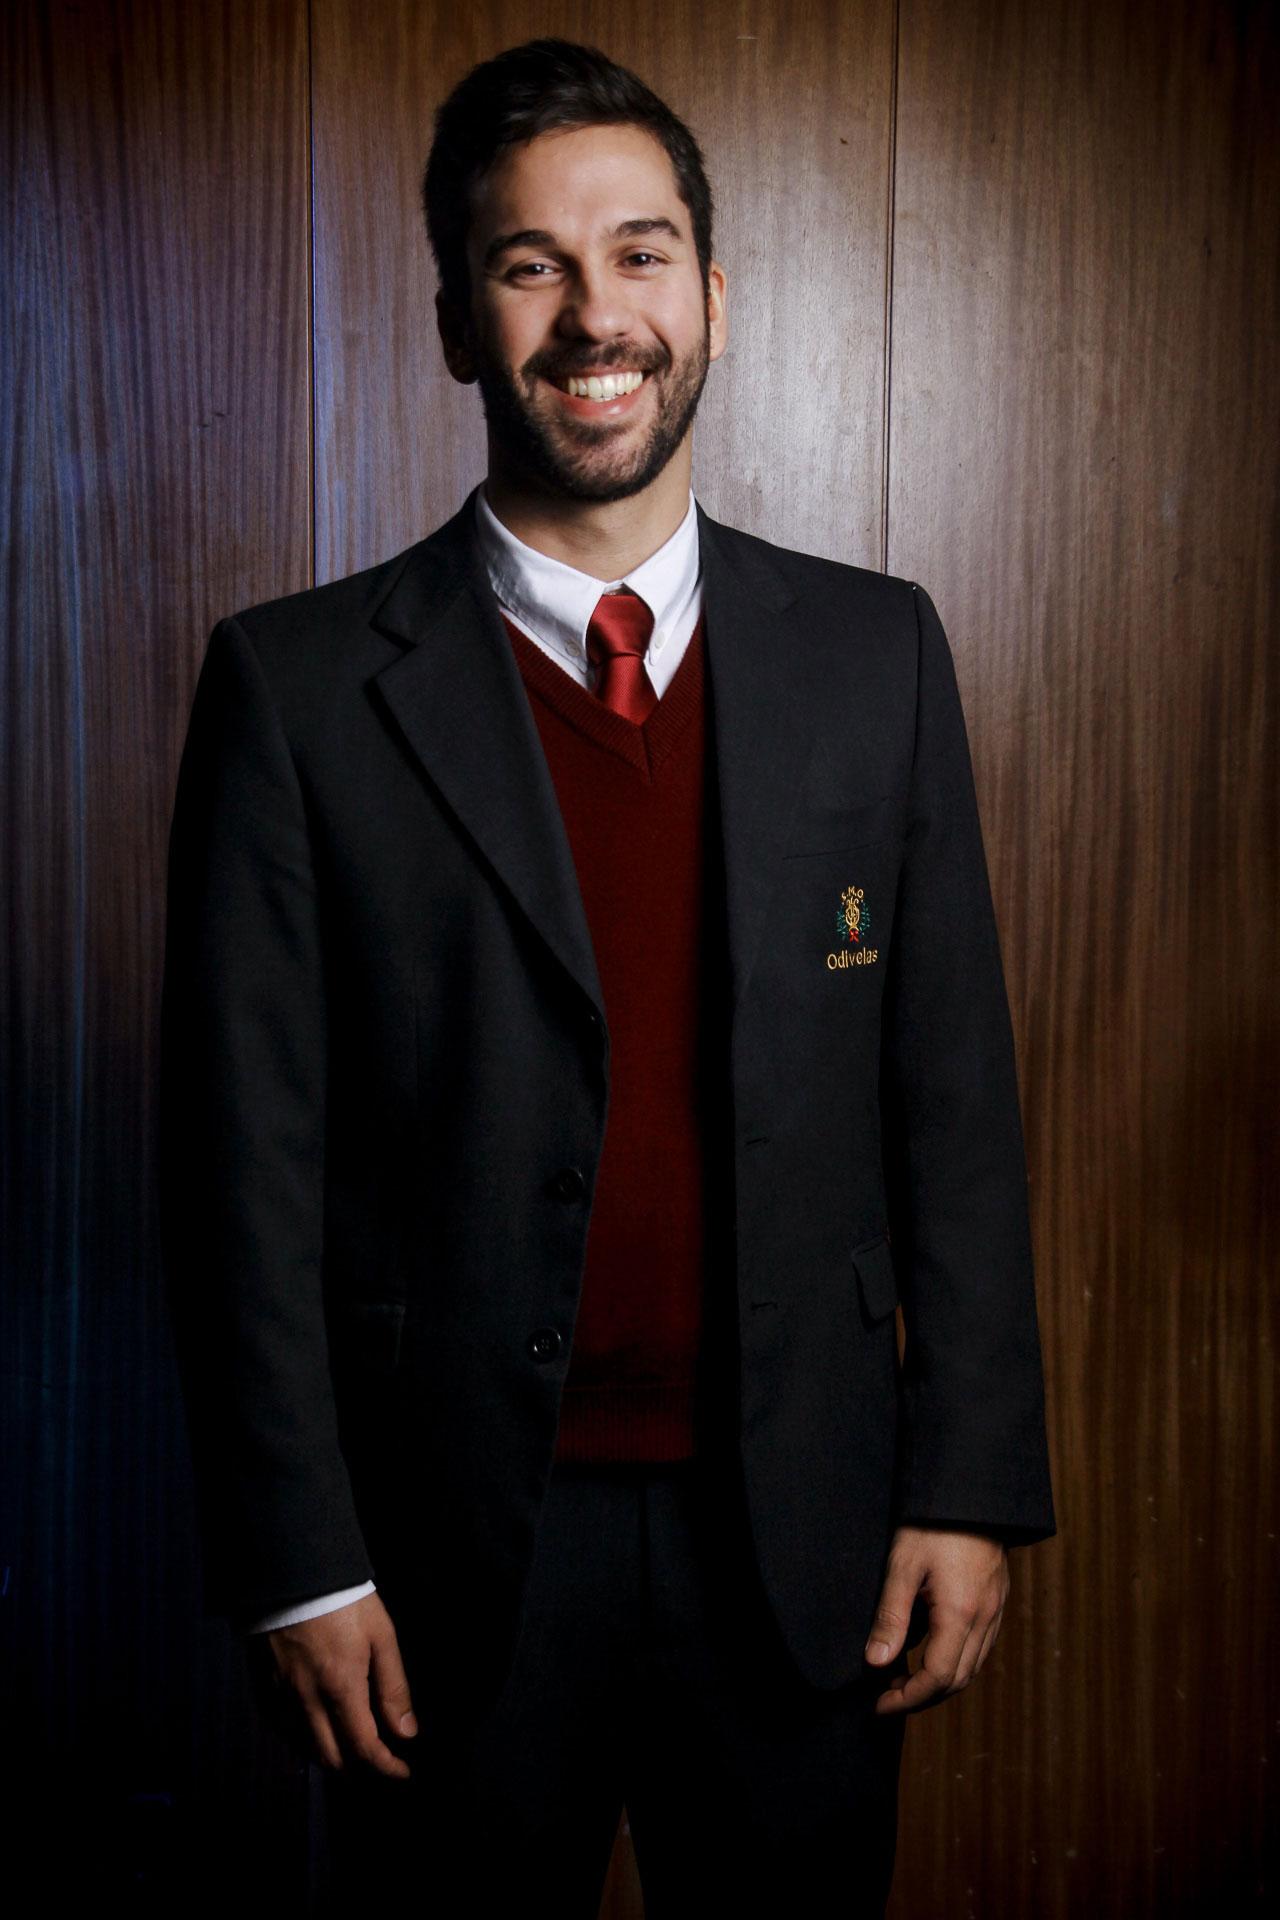 Miguel Sousa Clarinete